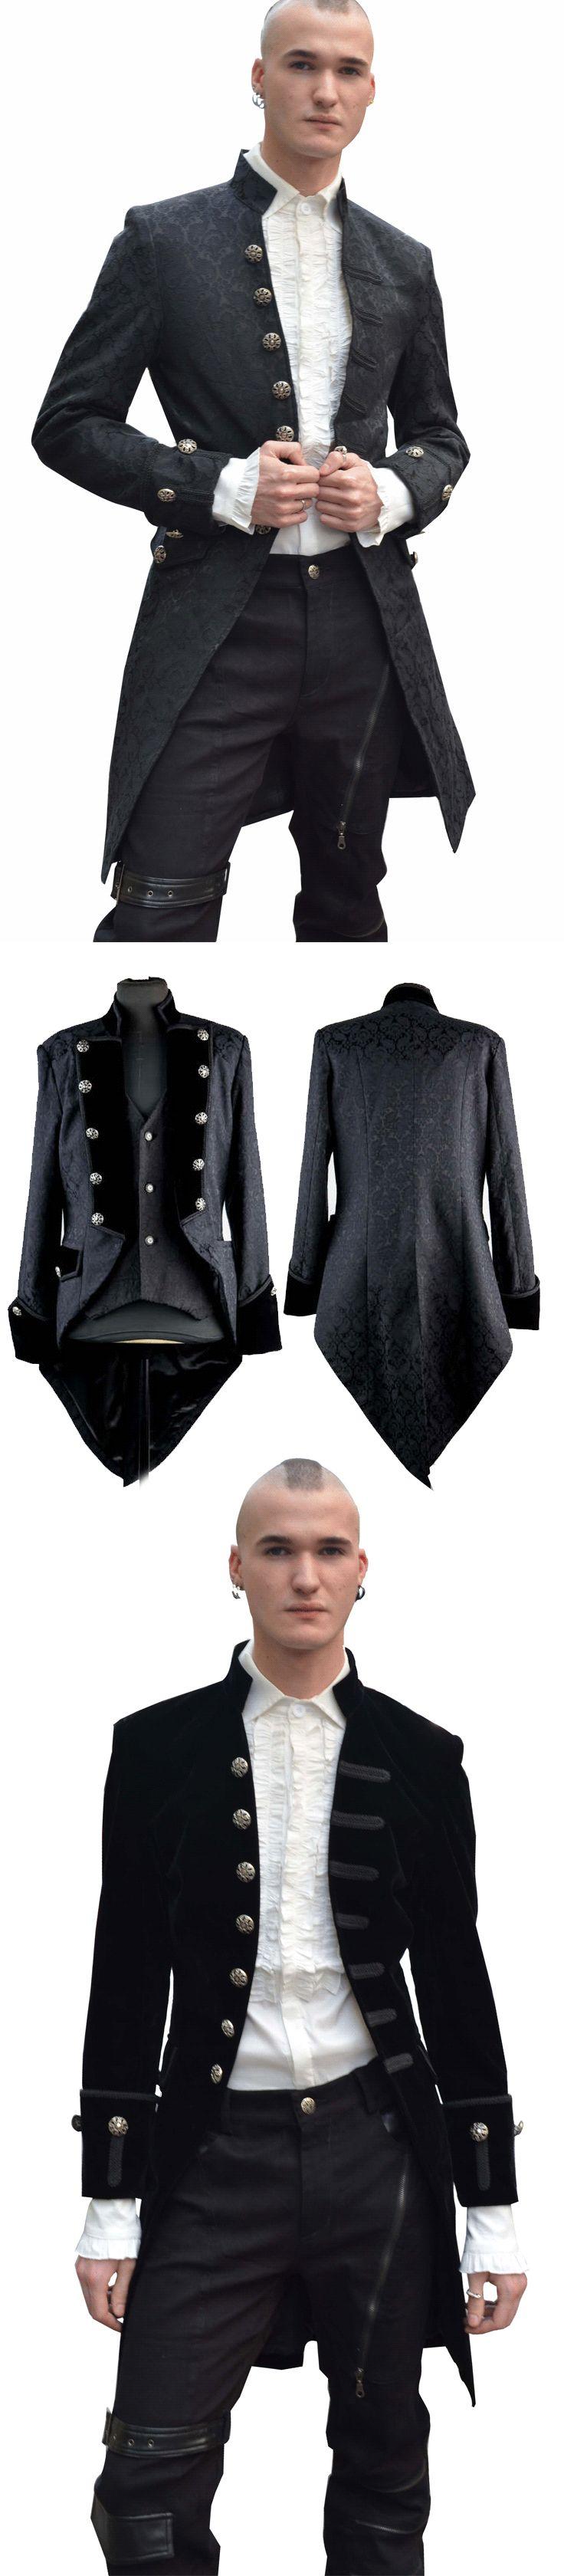 Shop gothic men's coats for fall at RebelsMarket!